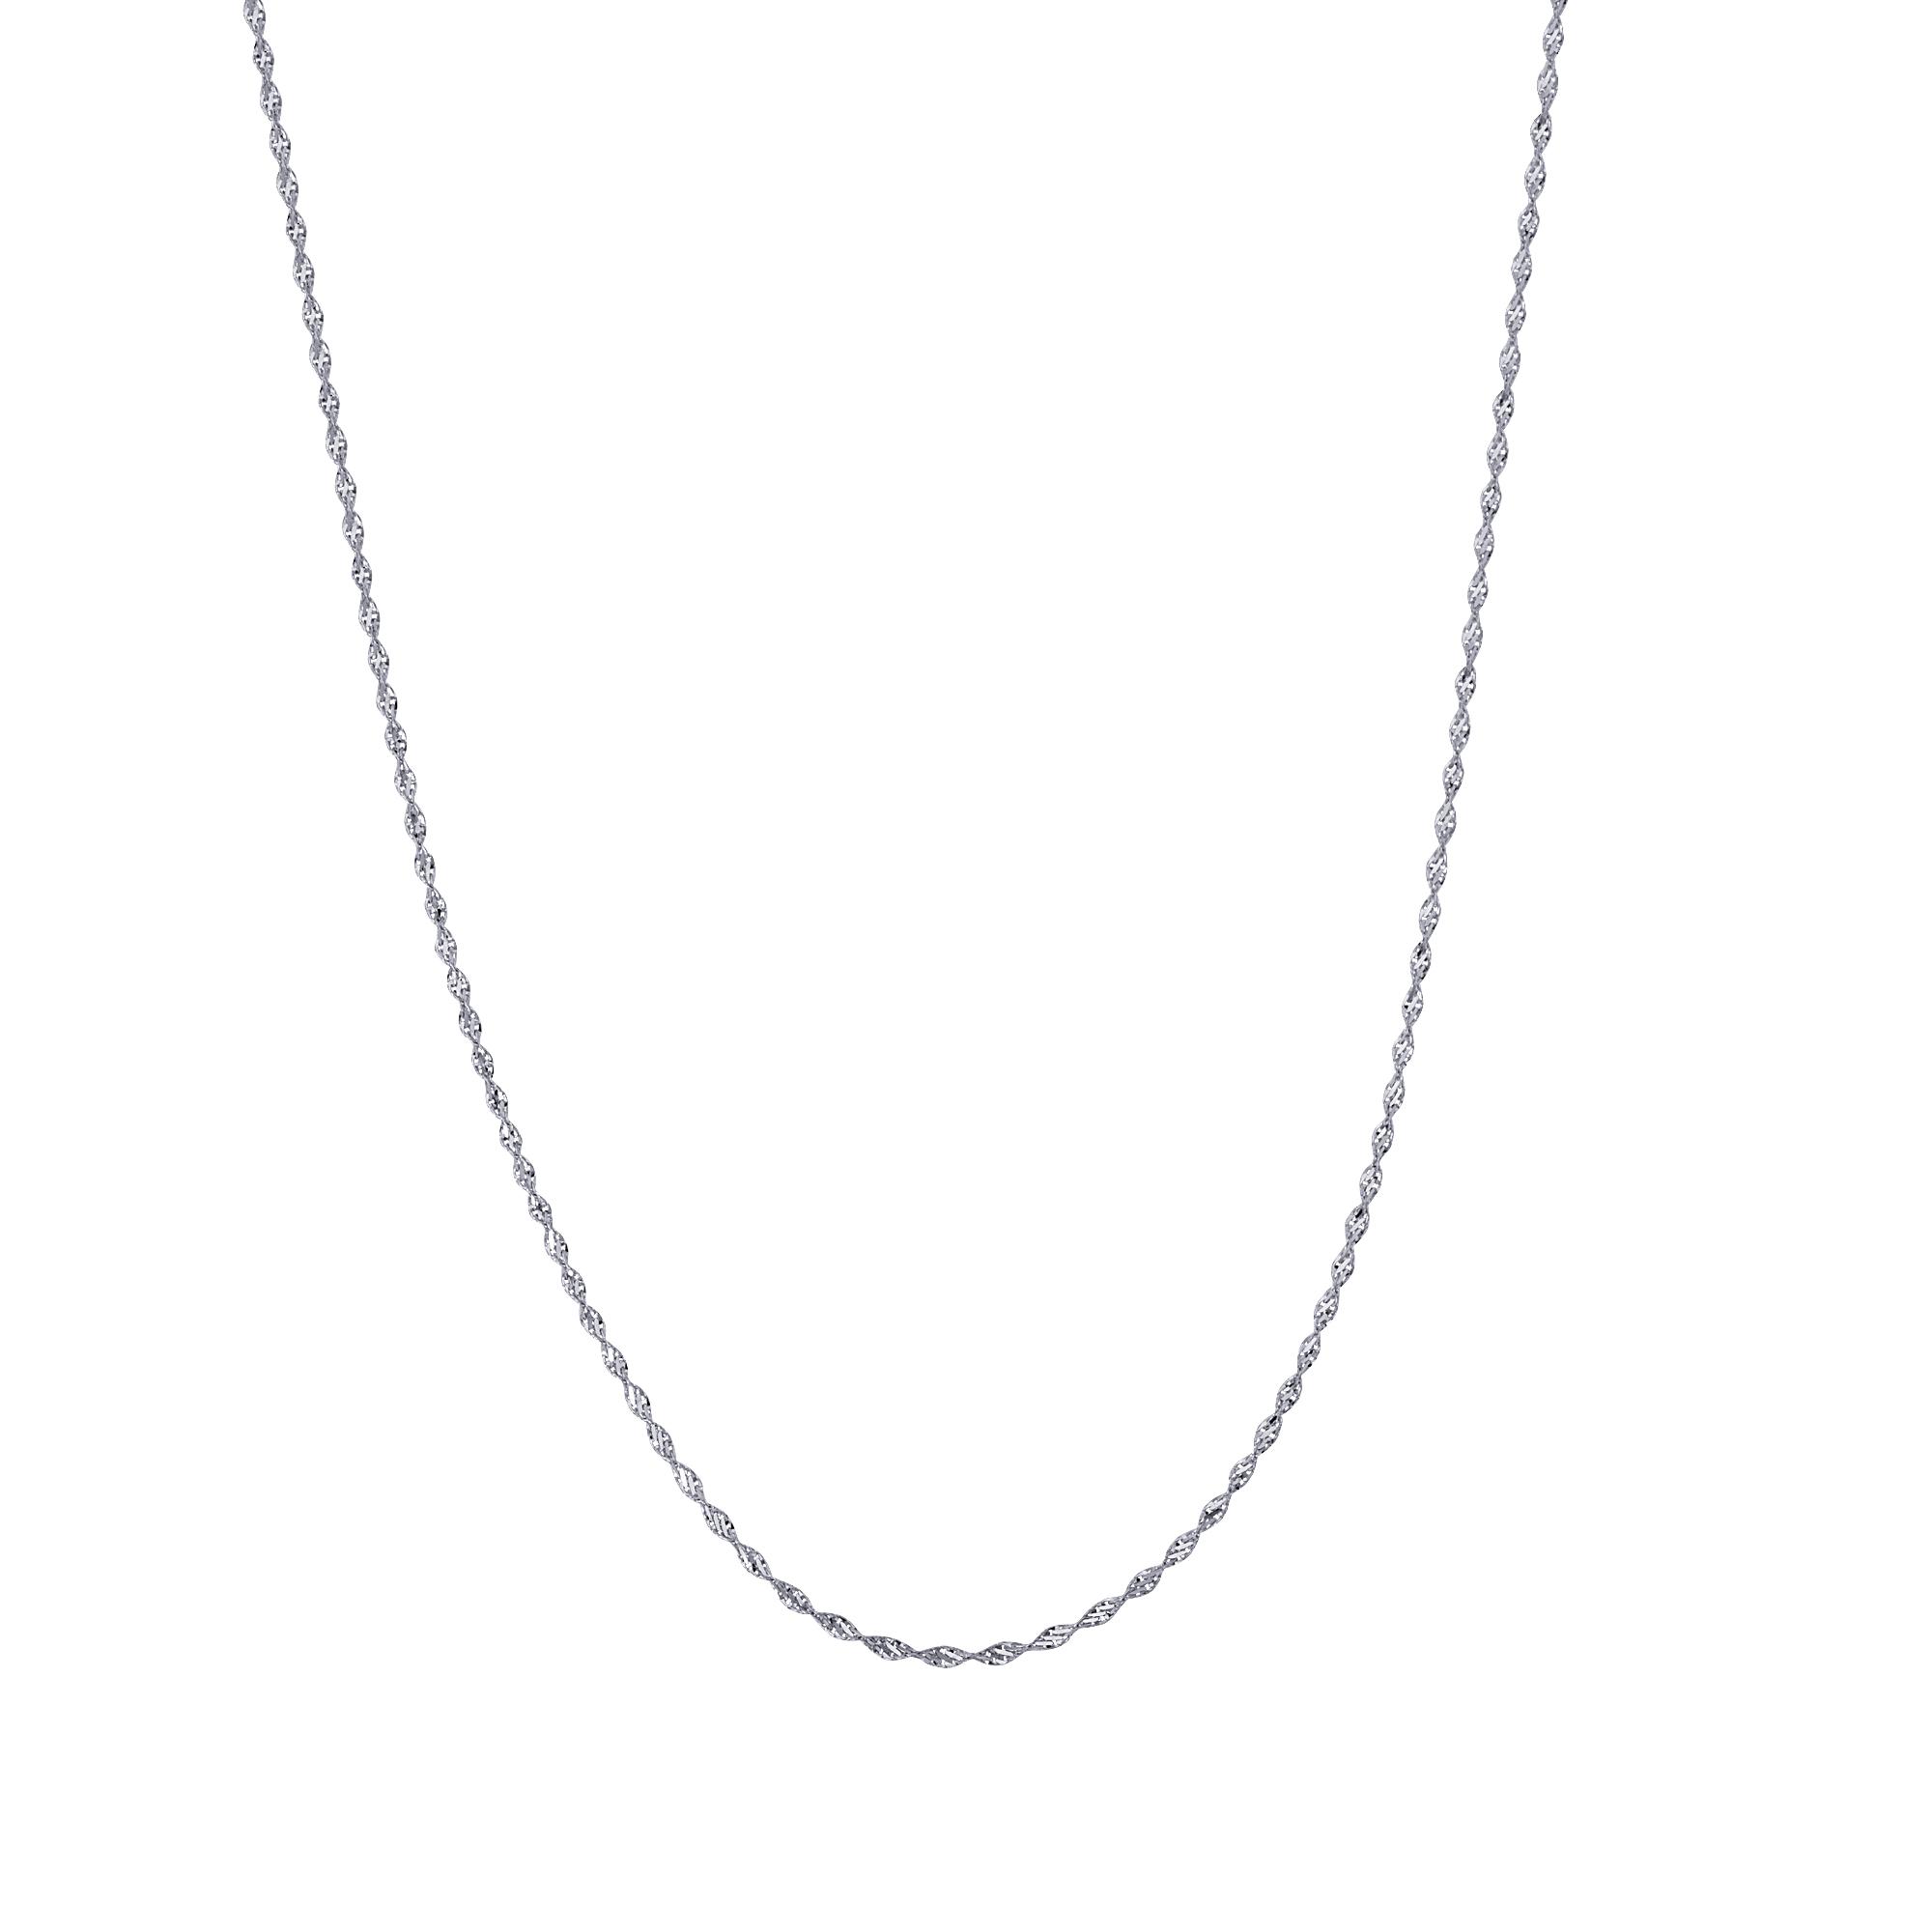 Dorica Chain, 14Kt Gold Dorica Chain With Lobster Lock / 20